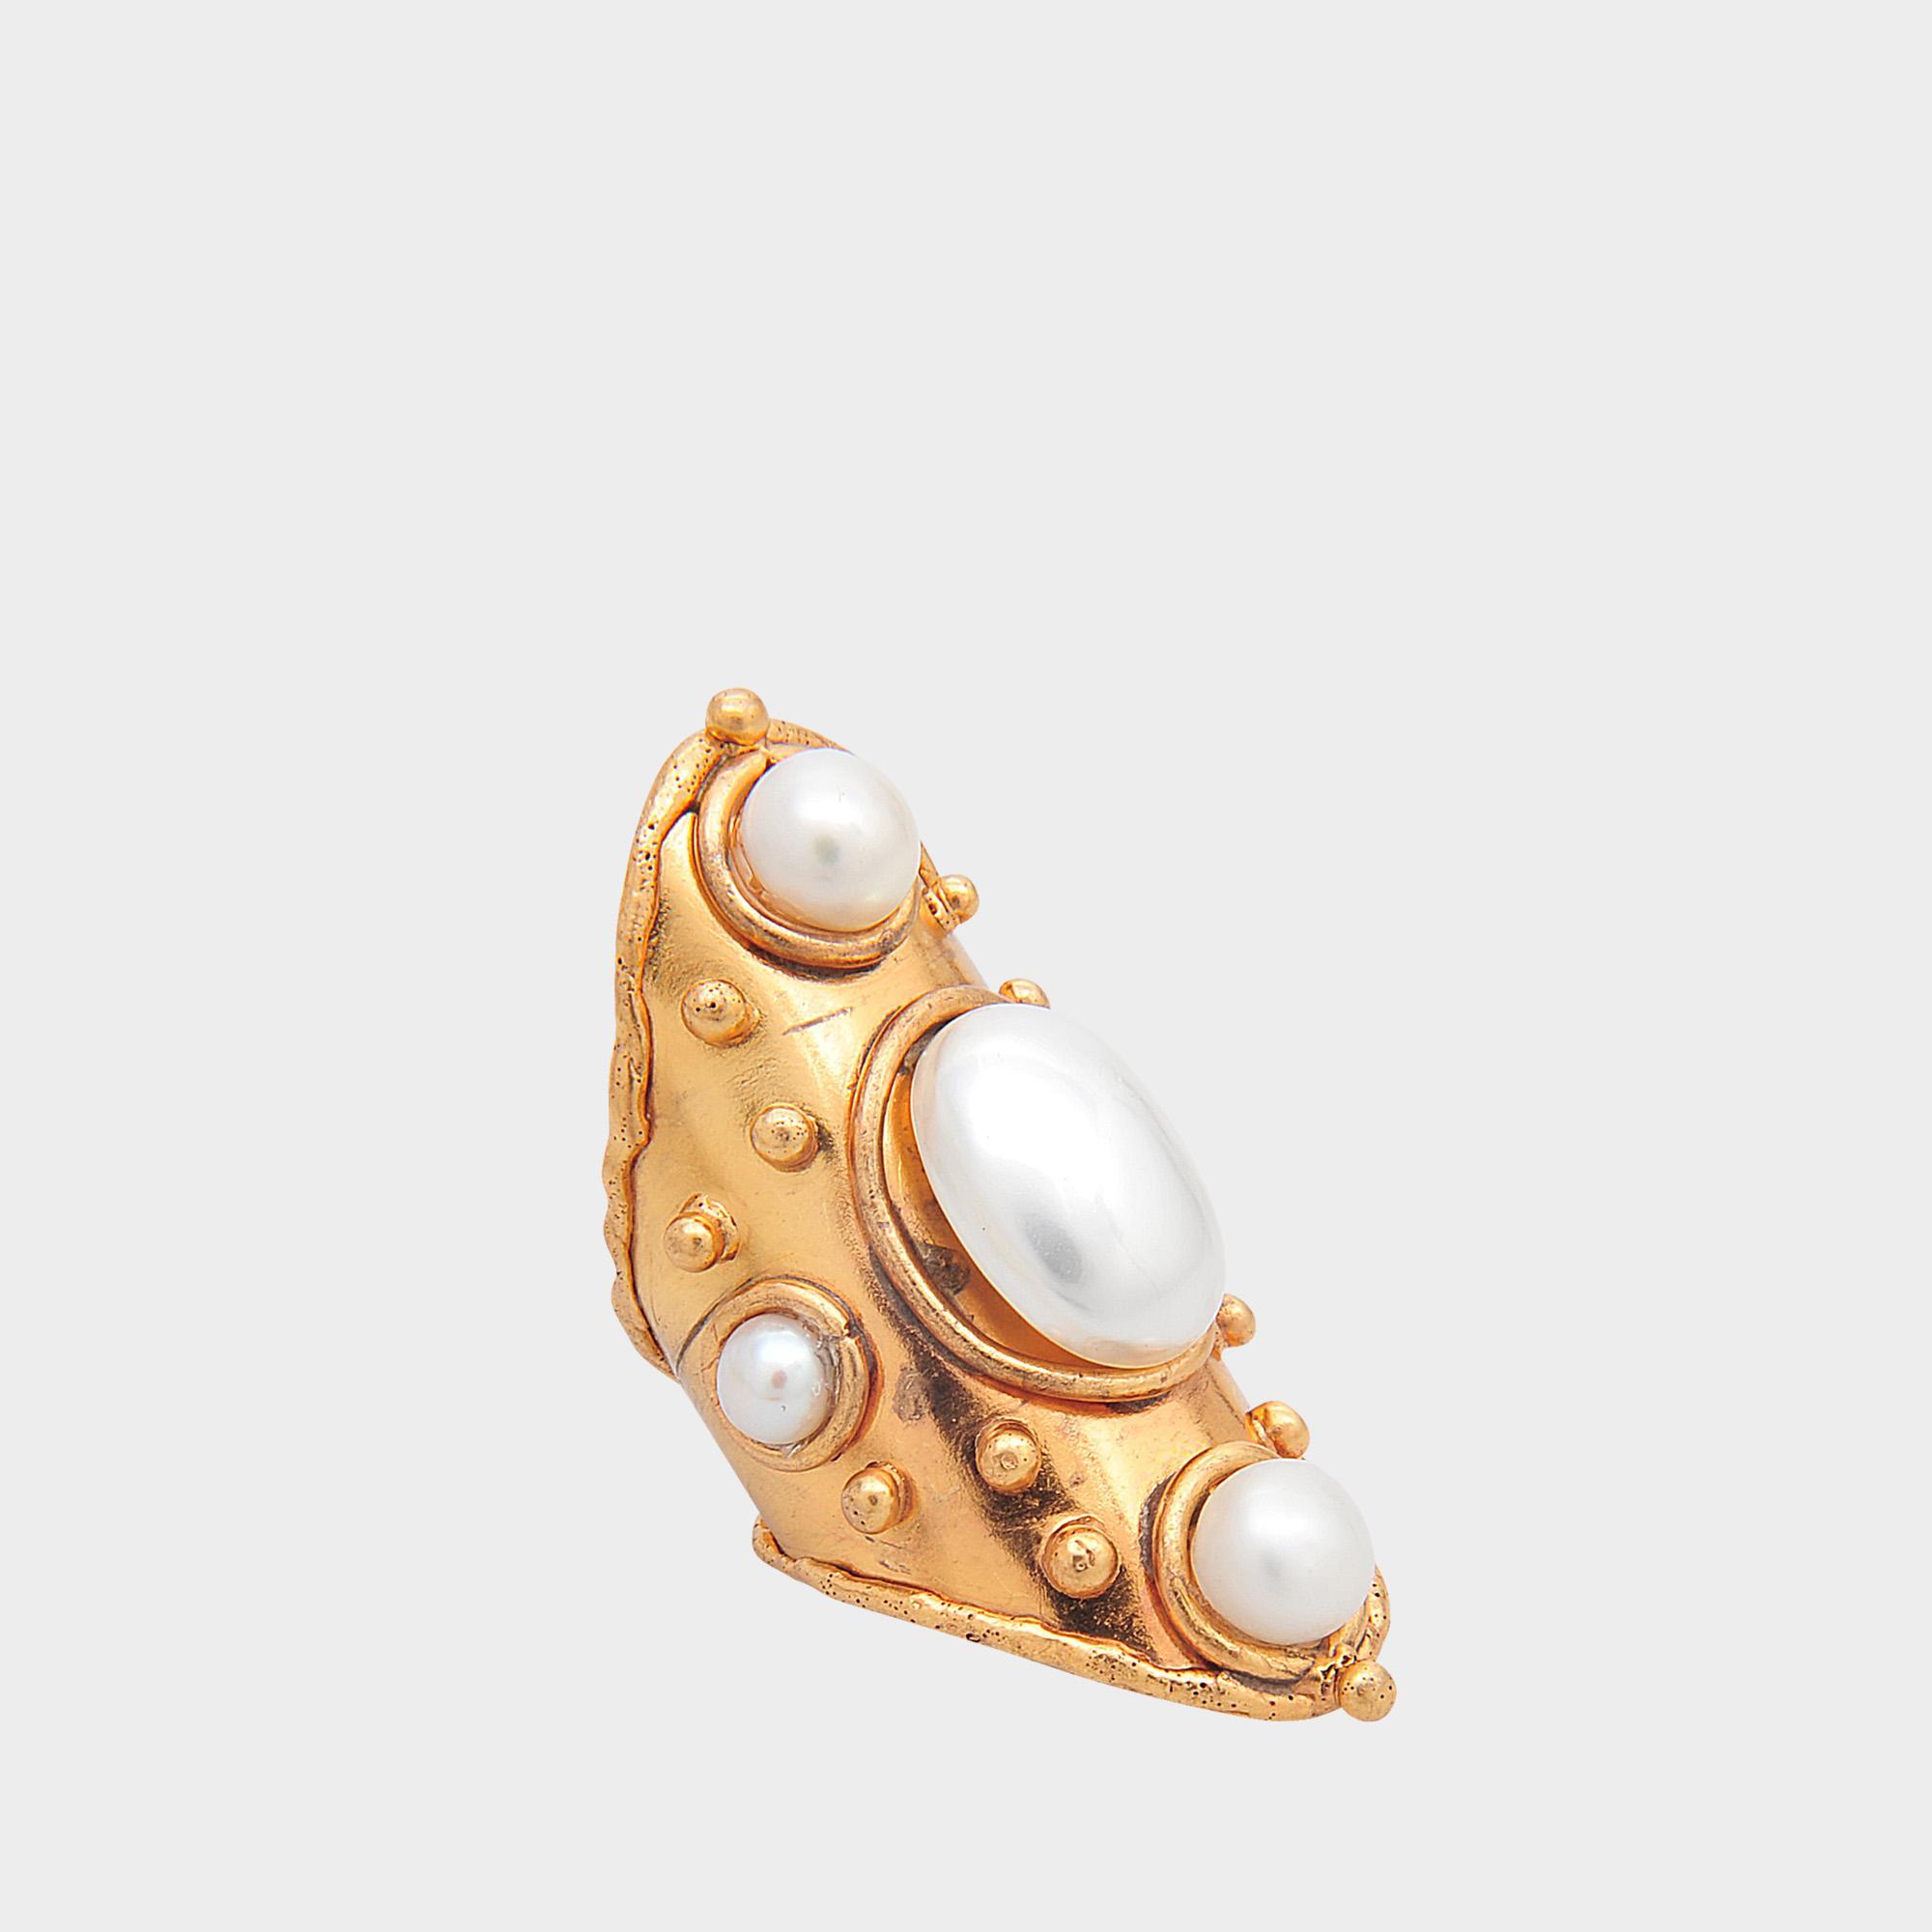 Sylvia Toledano Byzance Pearls ring 4OYaatYa